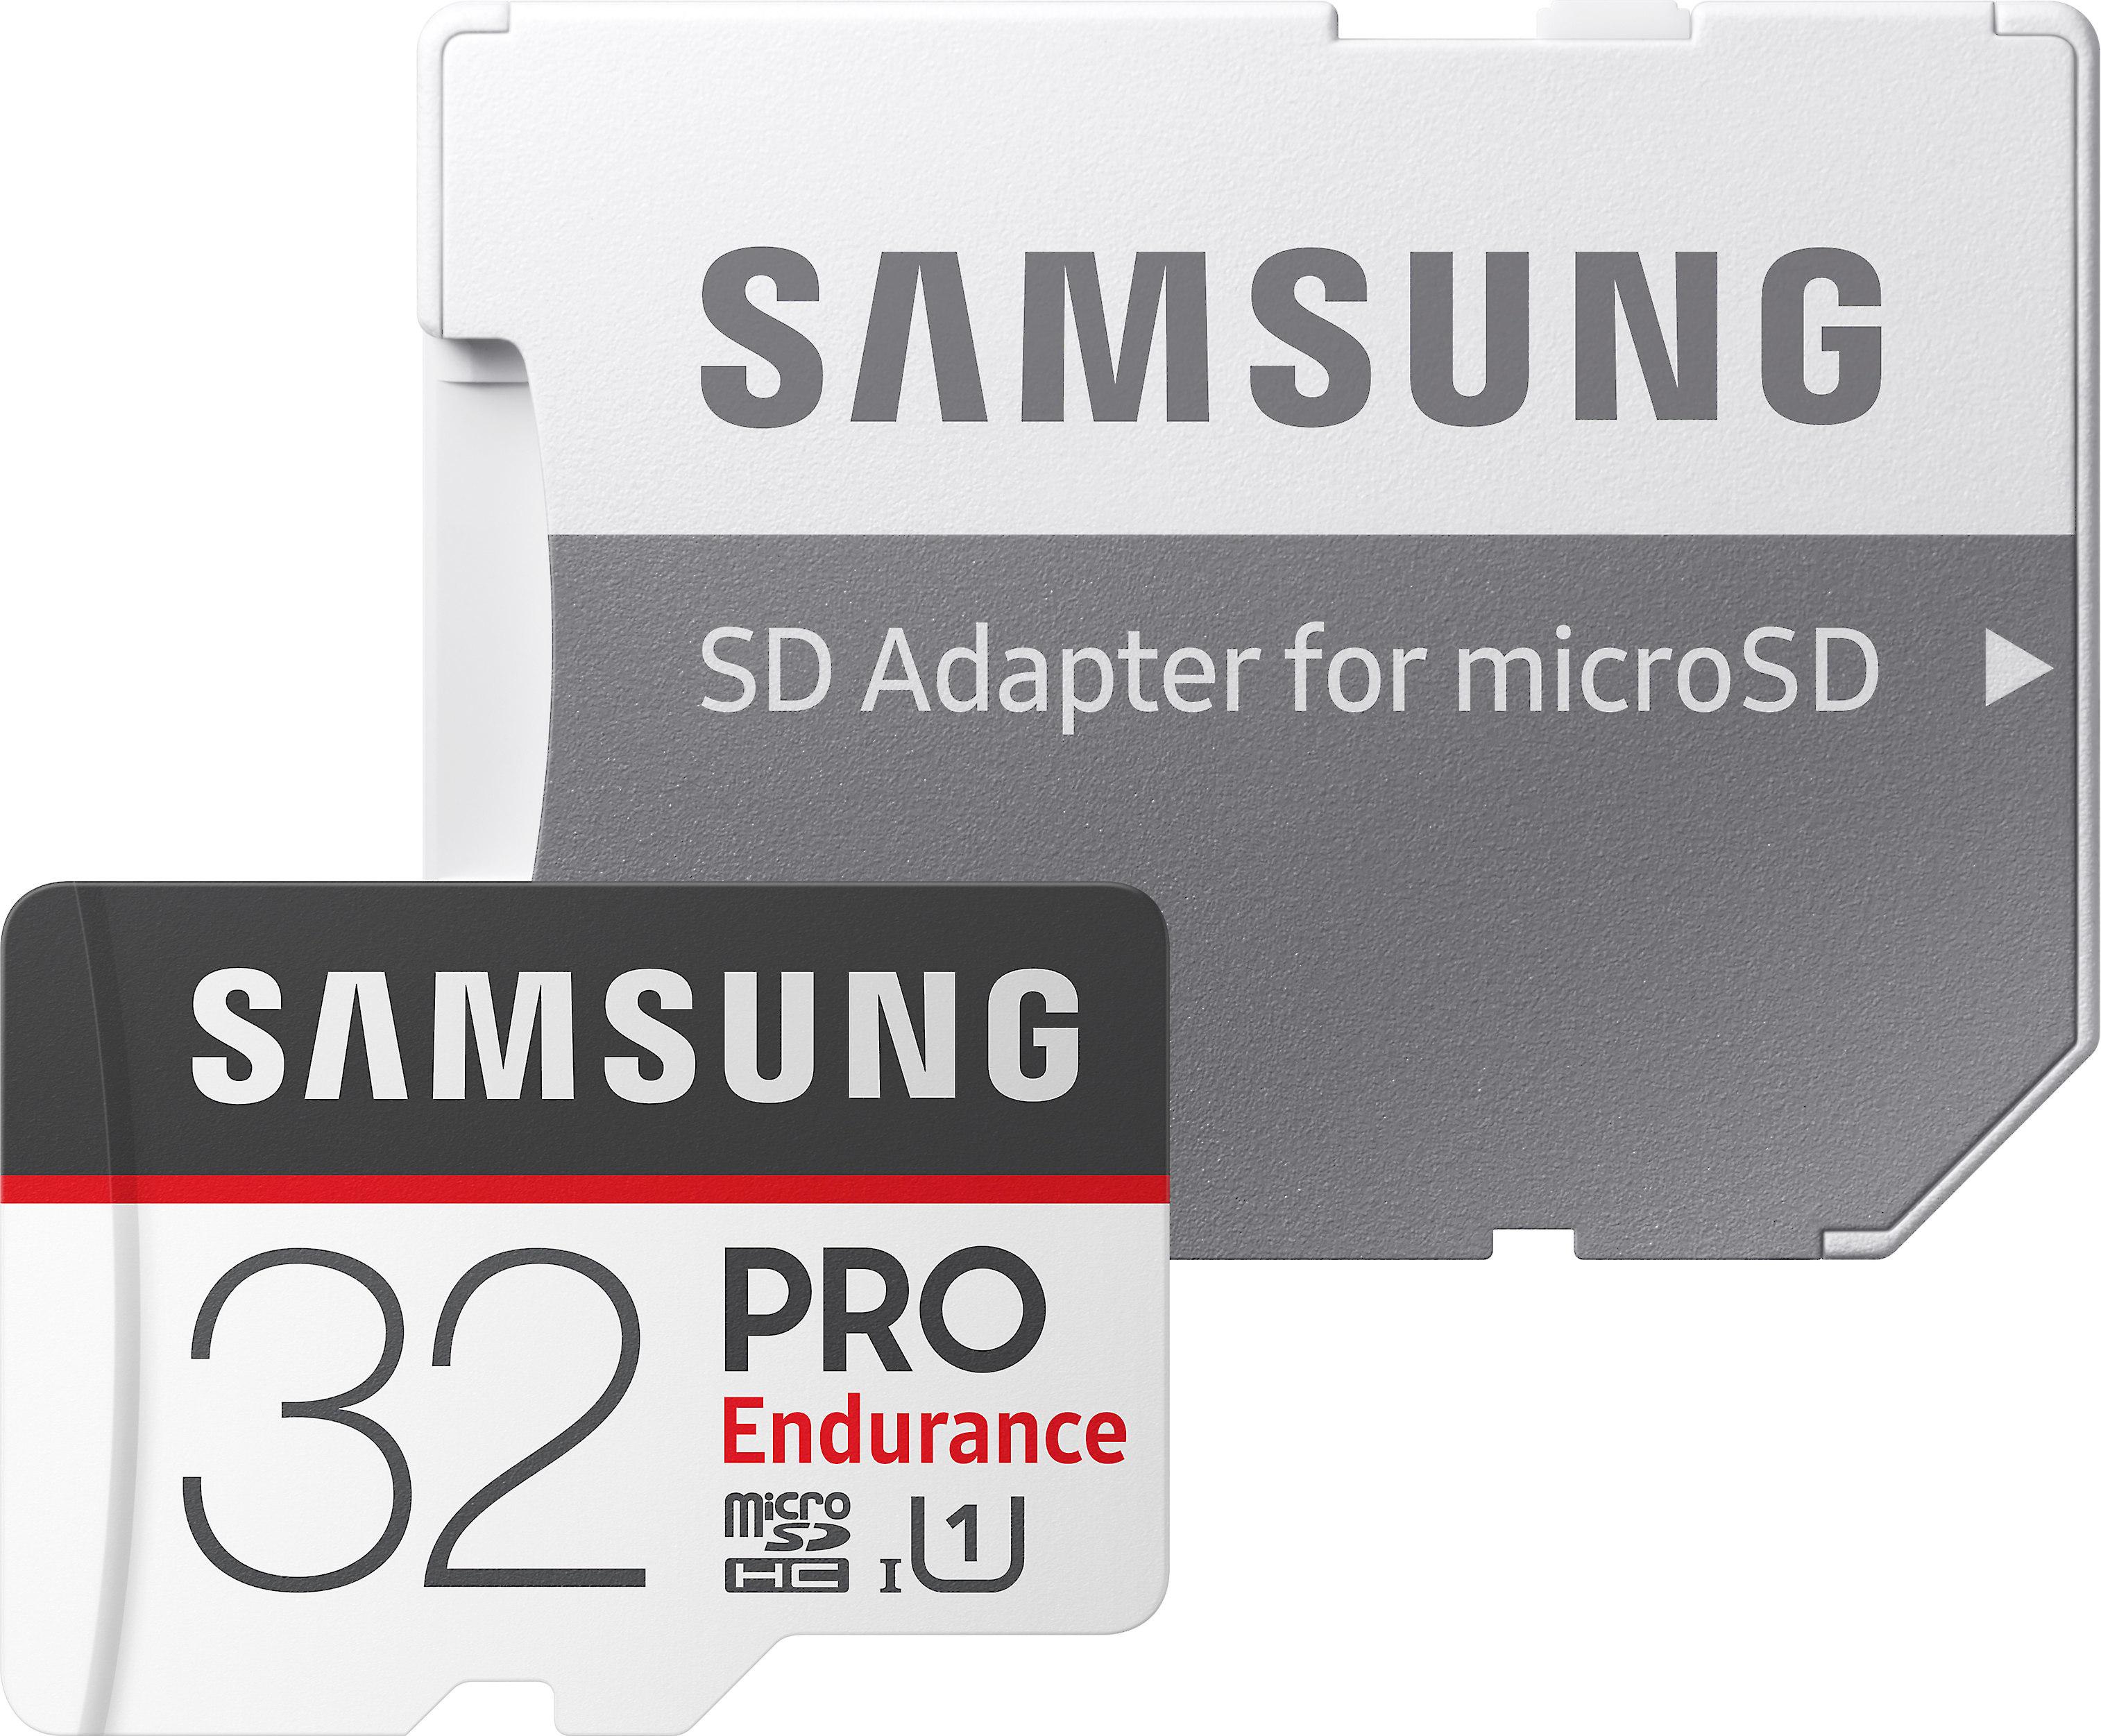 Samsung Pro Endurance microSDHC Memory Card (32GB)